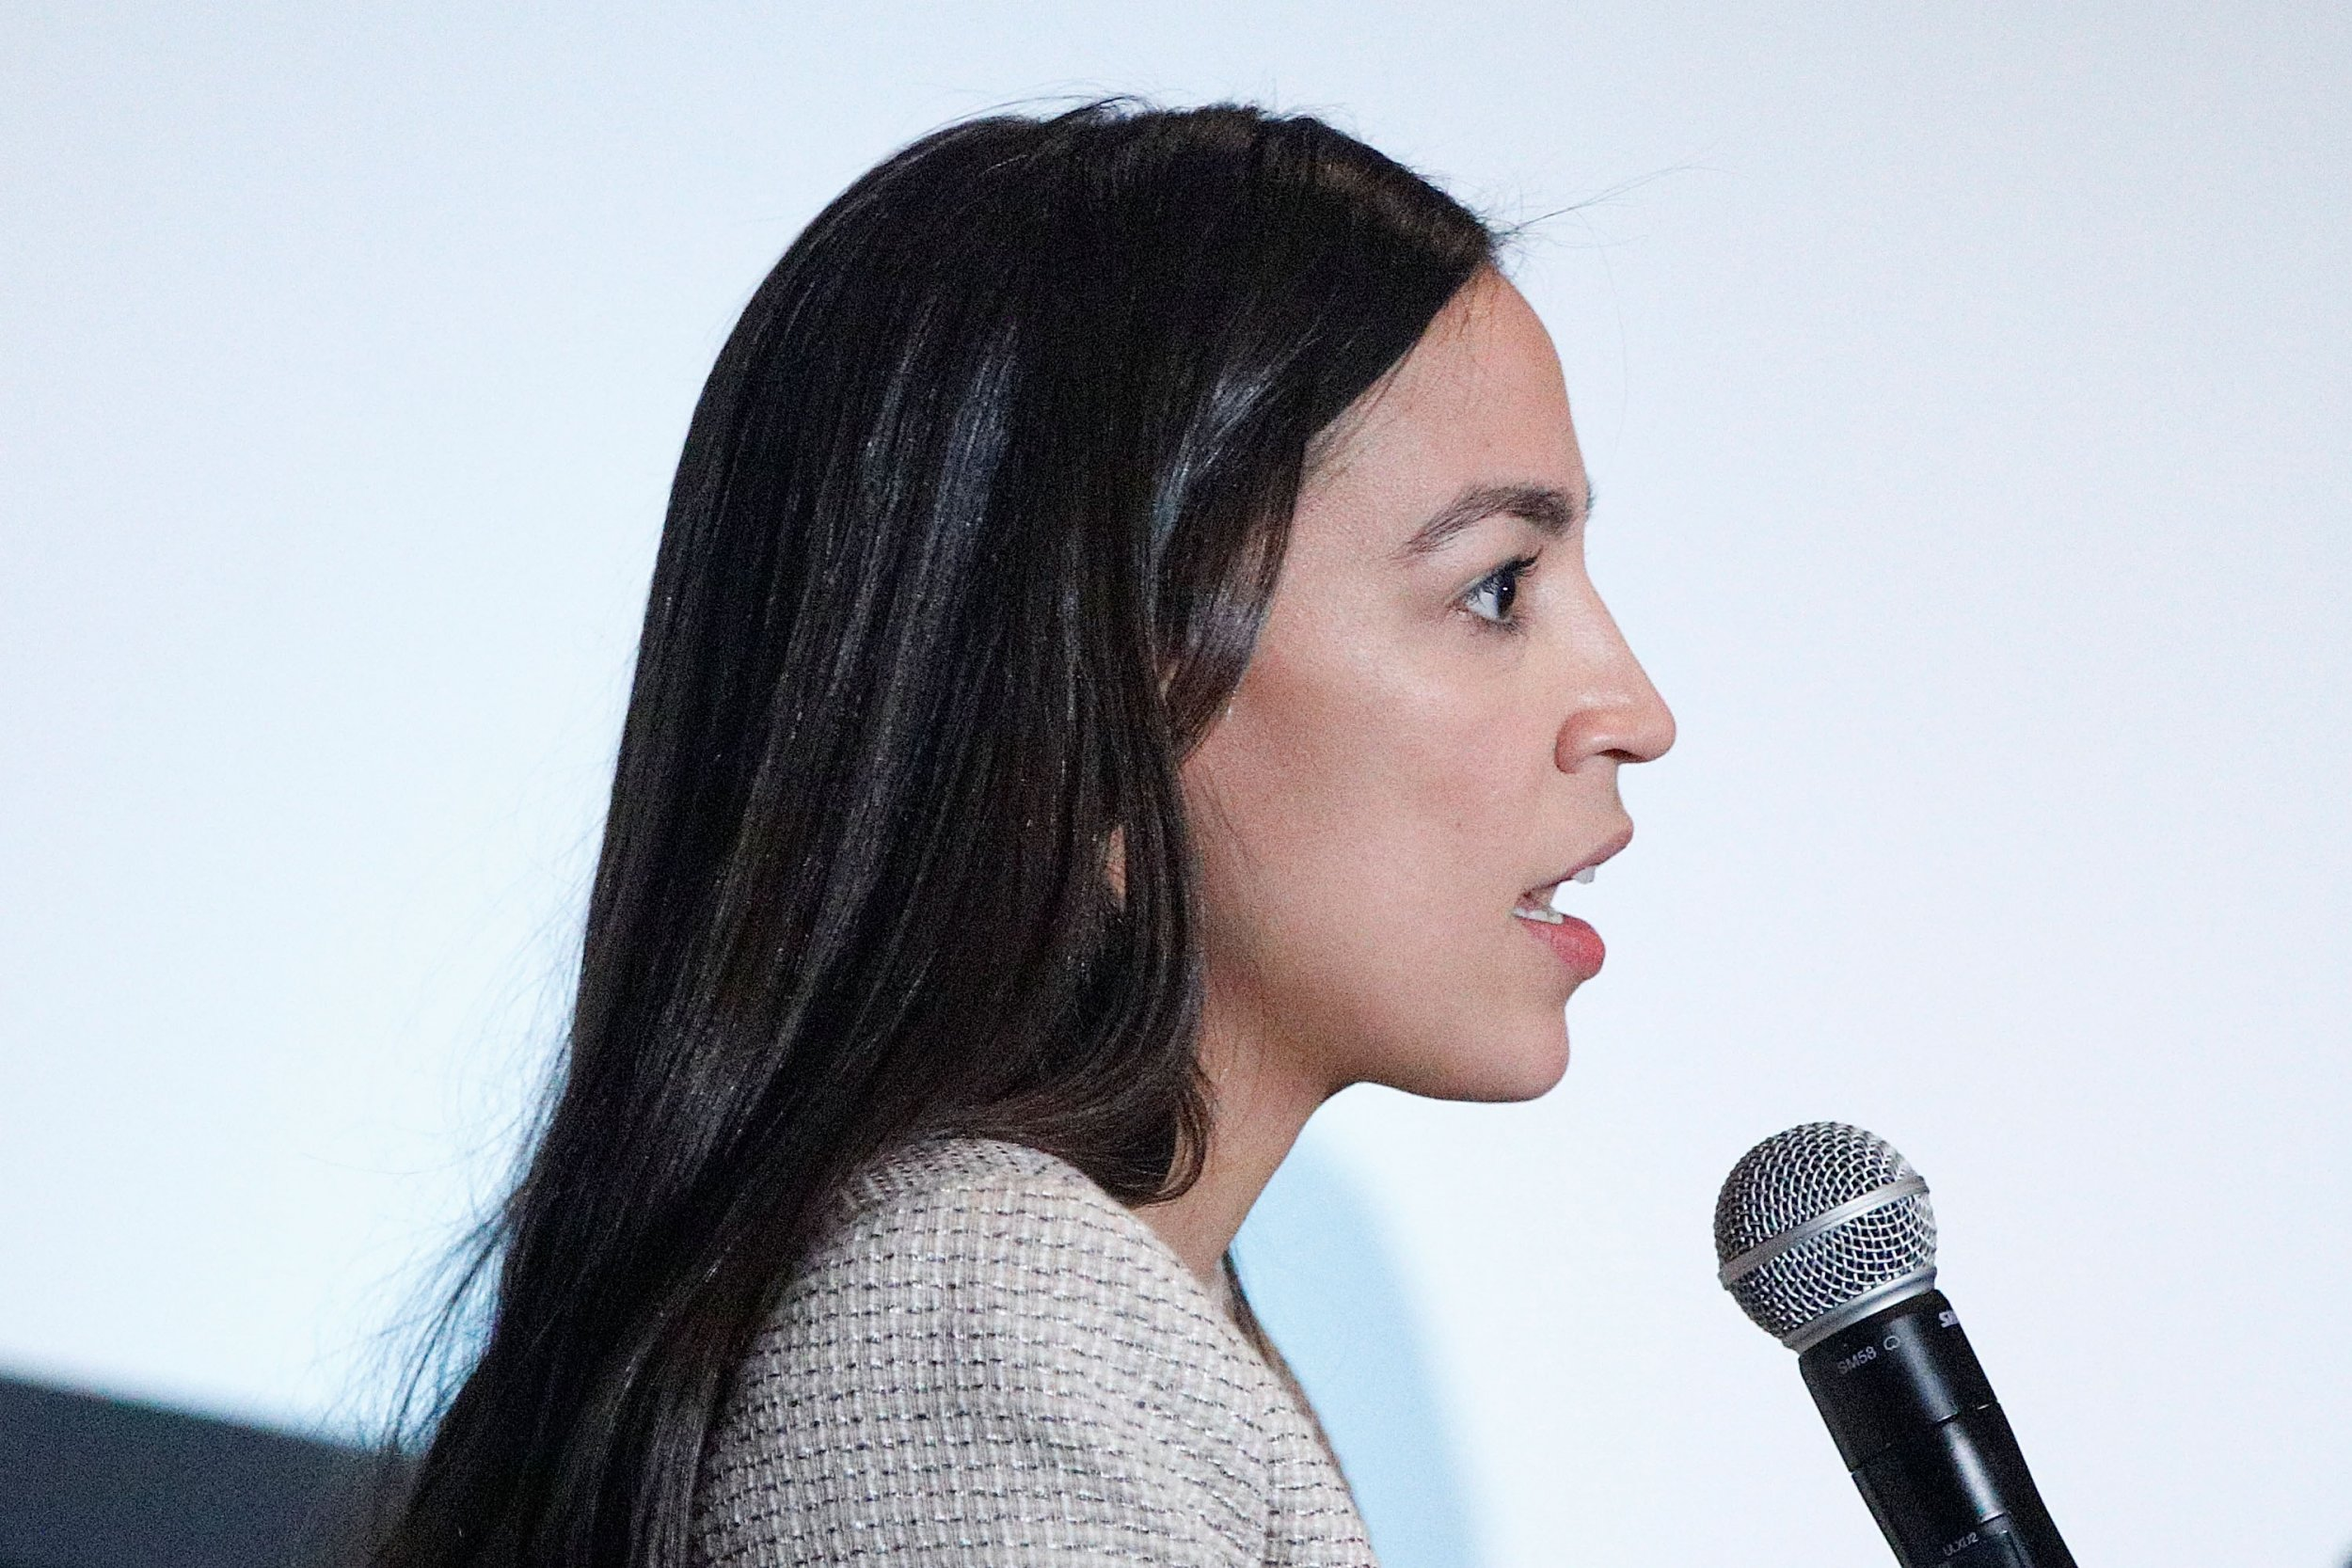 Alexandria Ocasio-Cortez, Tucker Carlson